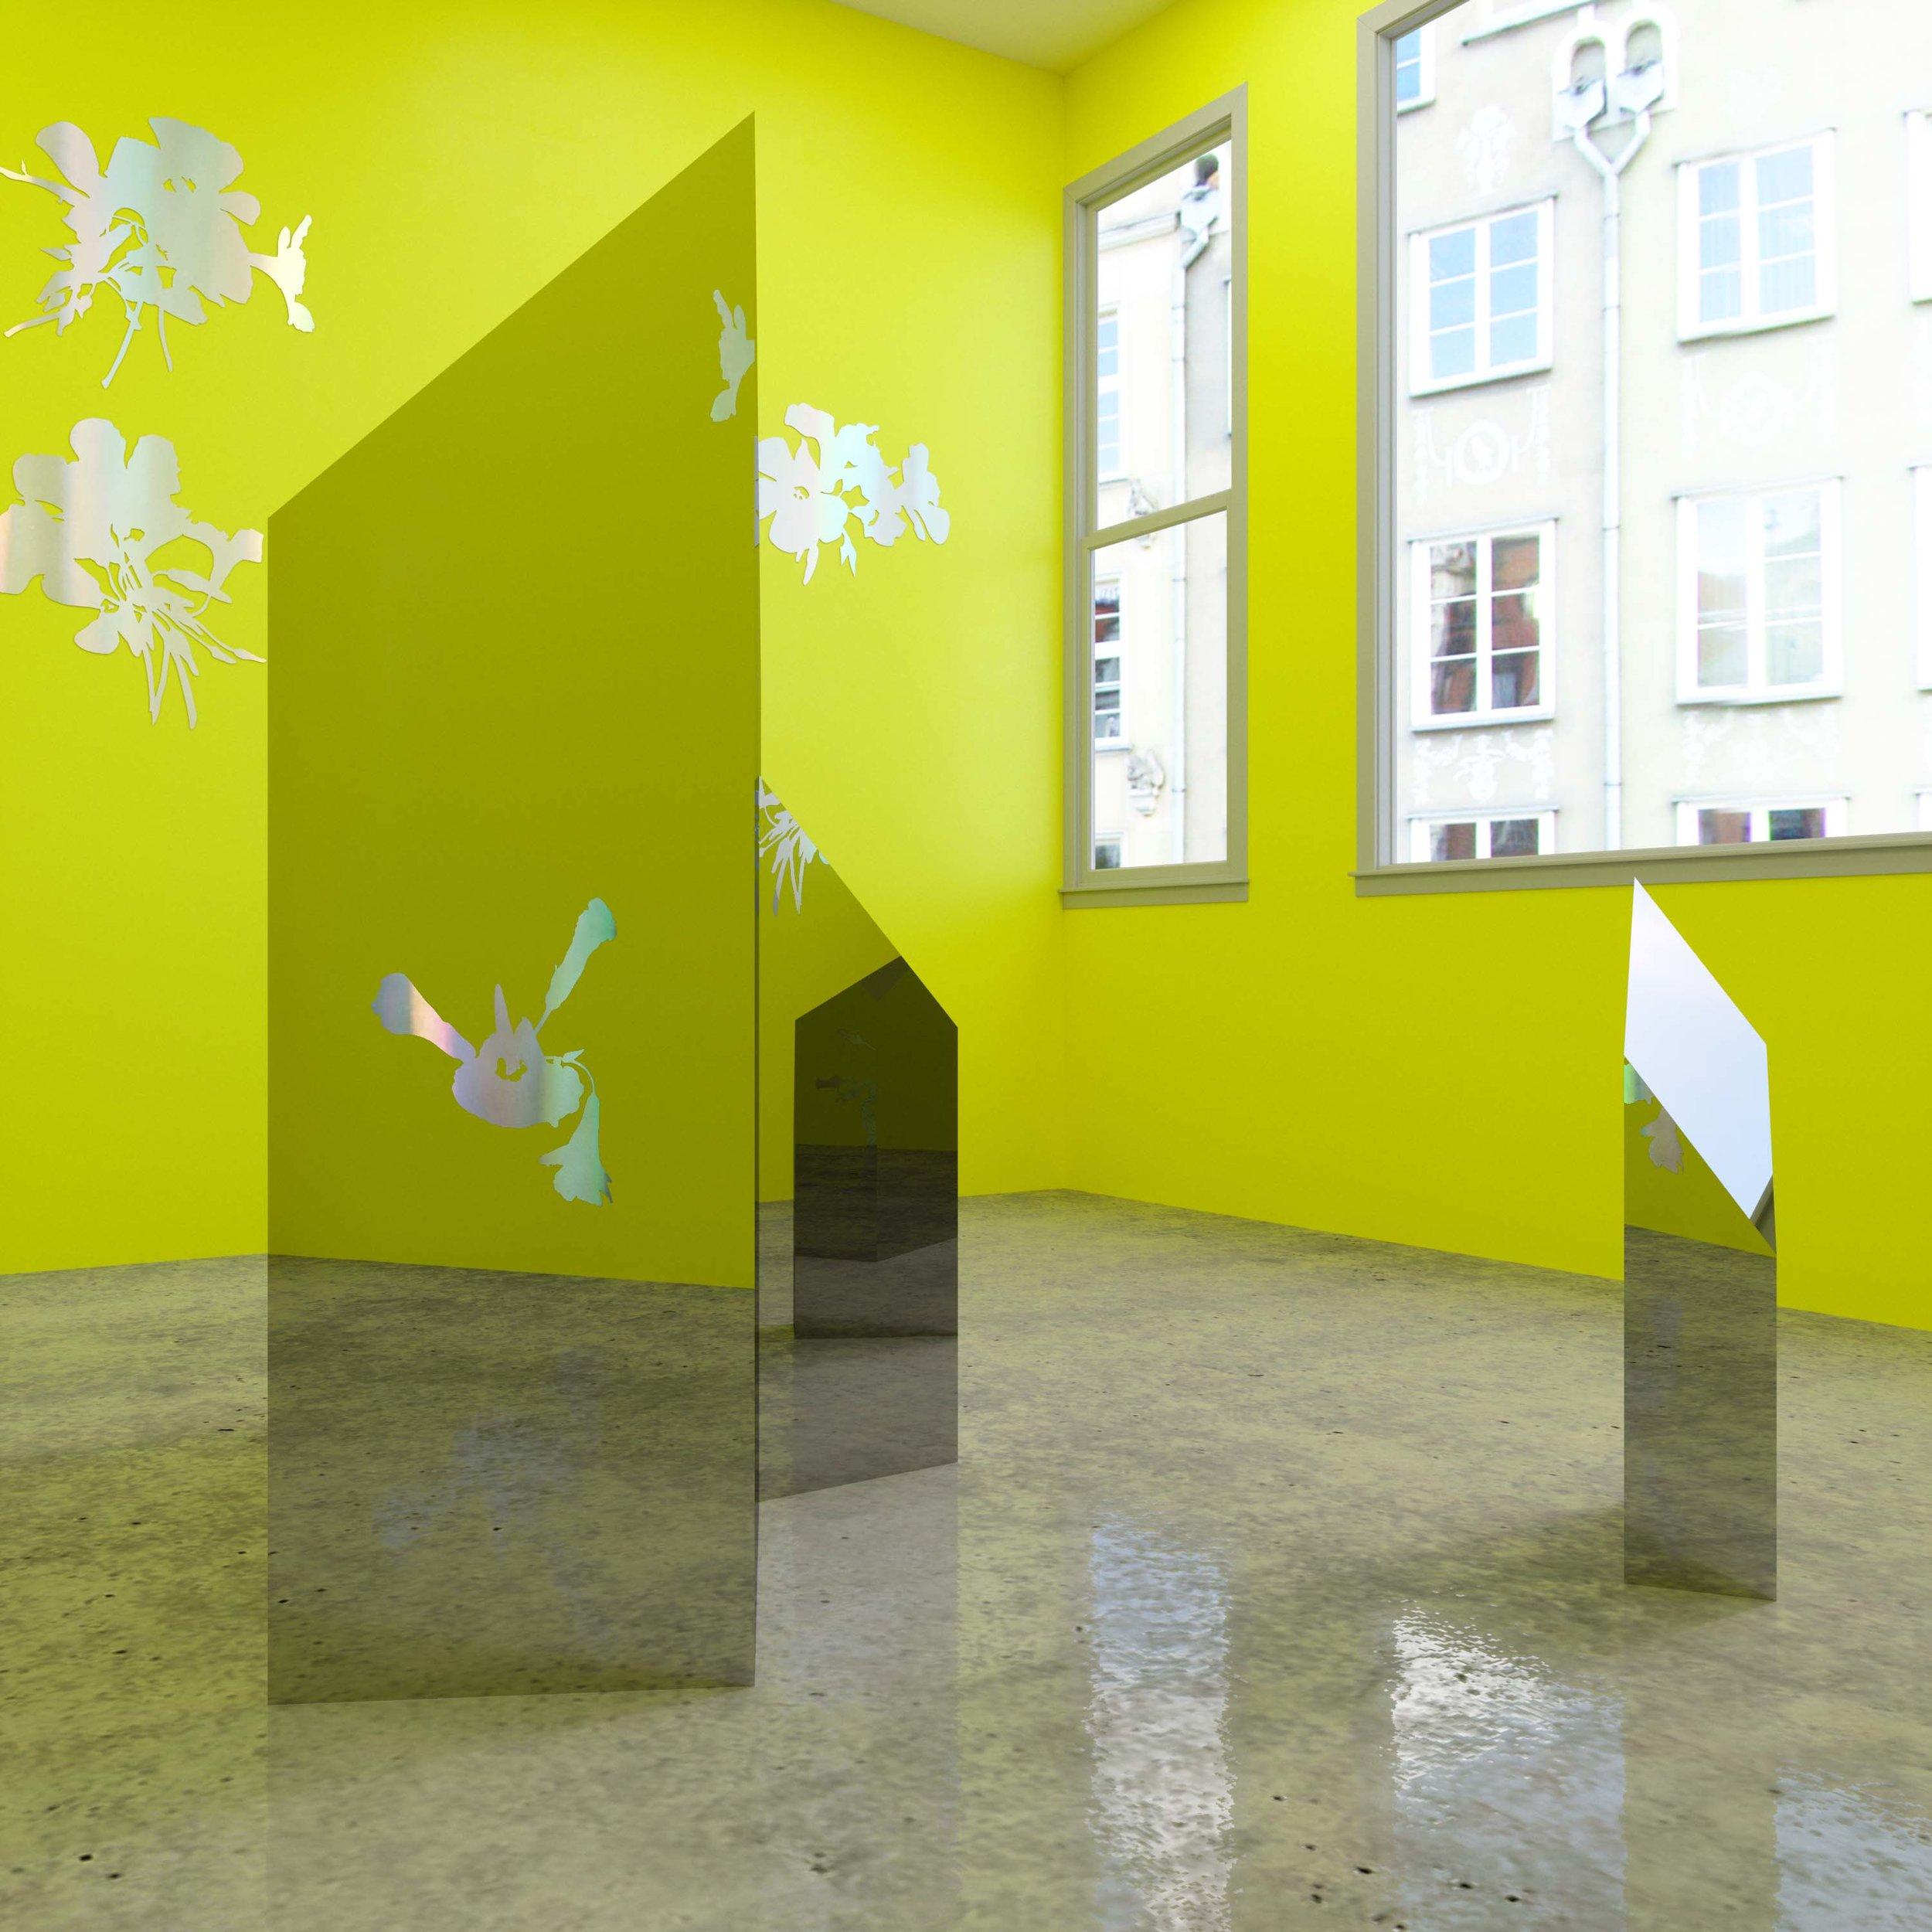 Ren Gregorčič, sour sour sob (installation view), 2018.